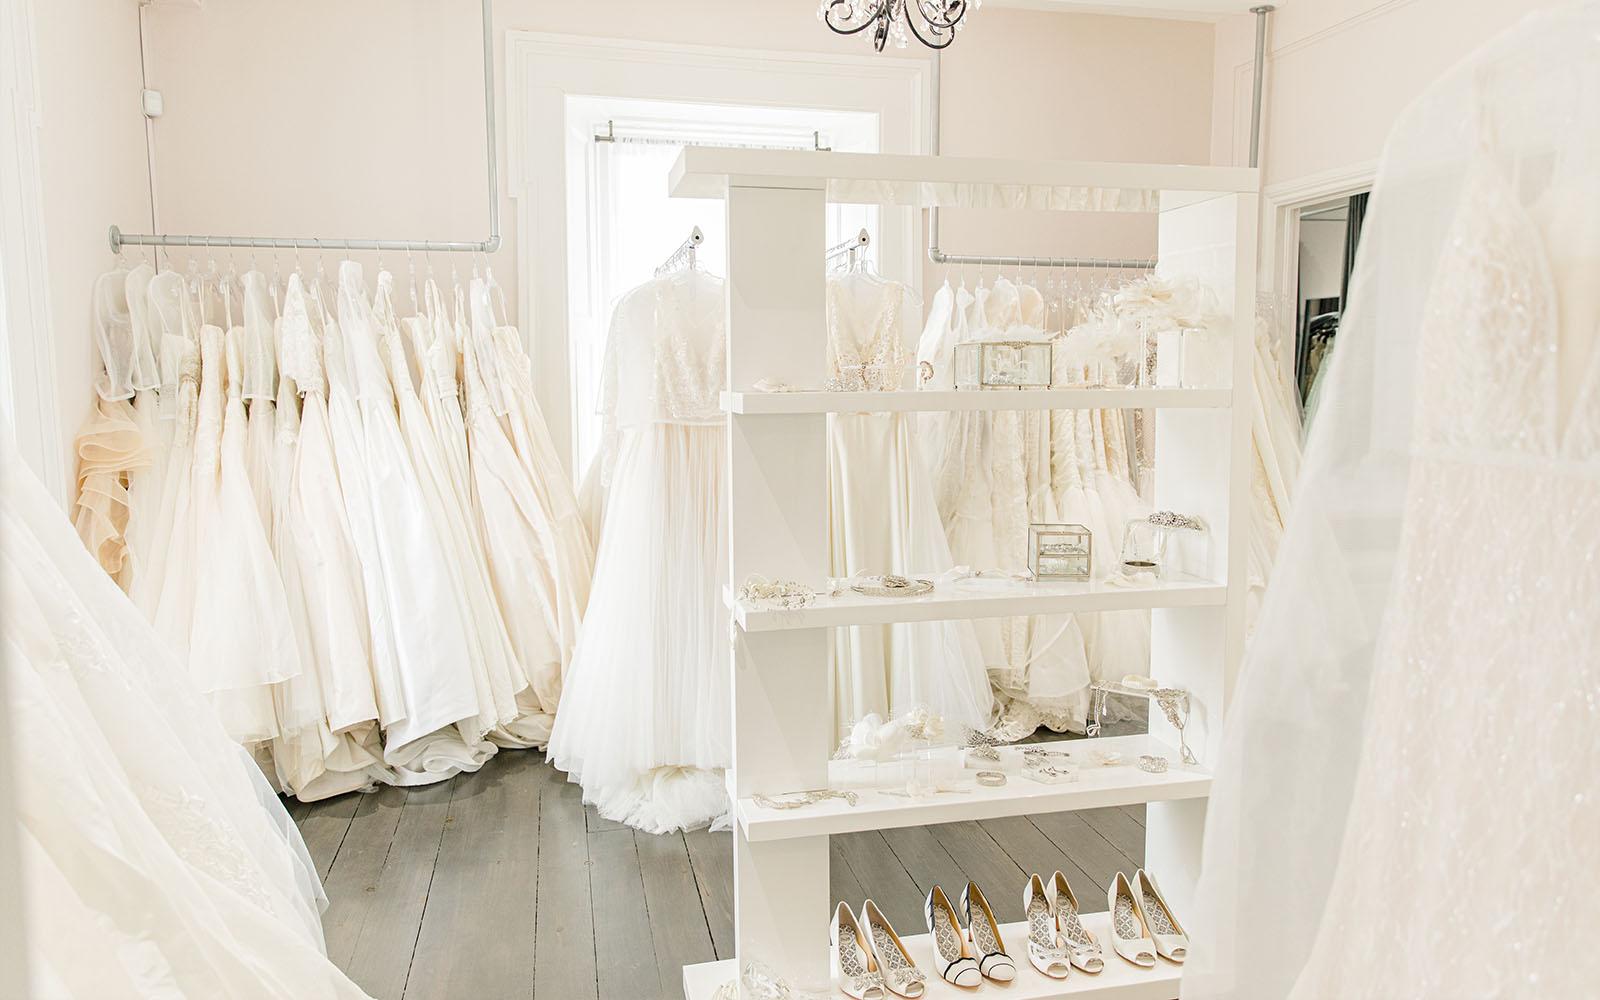 Stone House Dove Room - White Satin Bridal Boutique Ottawa - Designer & Luxury Wedding Gown - Off the rack & custom order - Bridal Seamstress